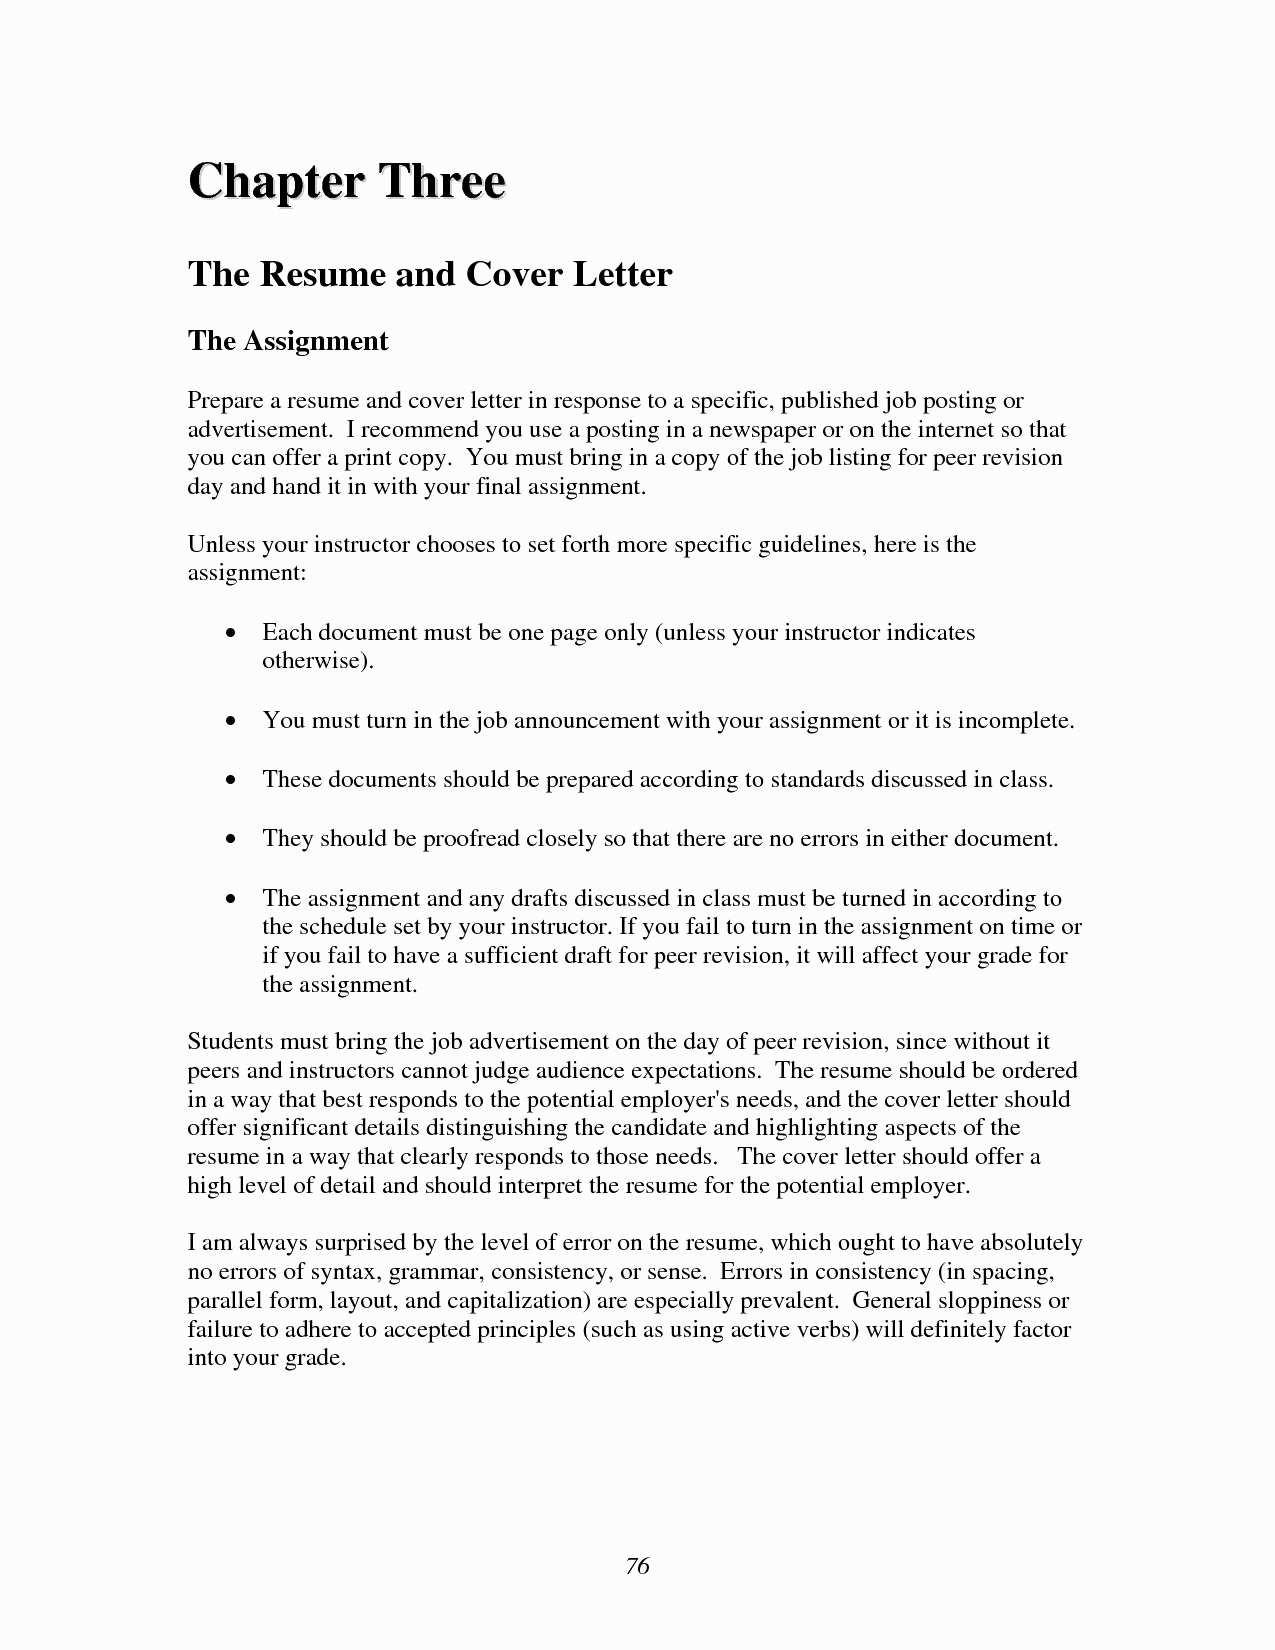 Job Offer Letter Template - Job Fer Letter Template Us Copy Od Consultant Cover Letter Fungram